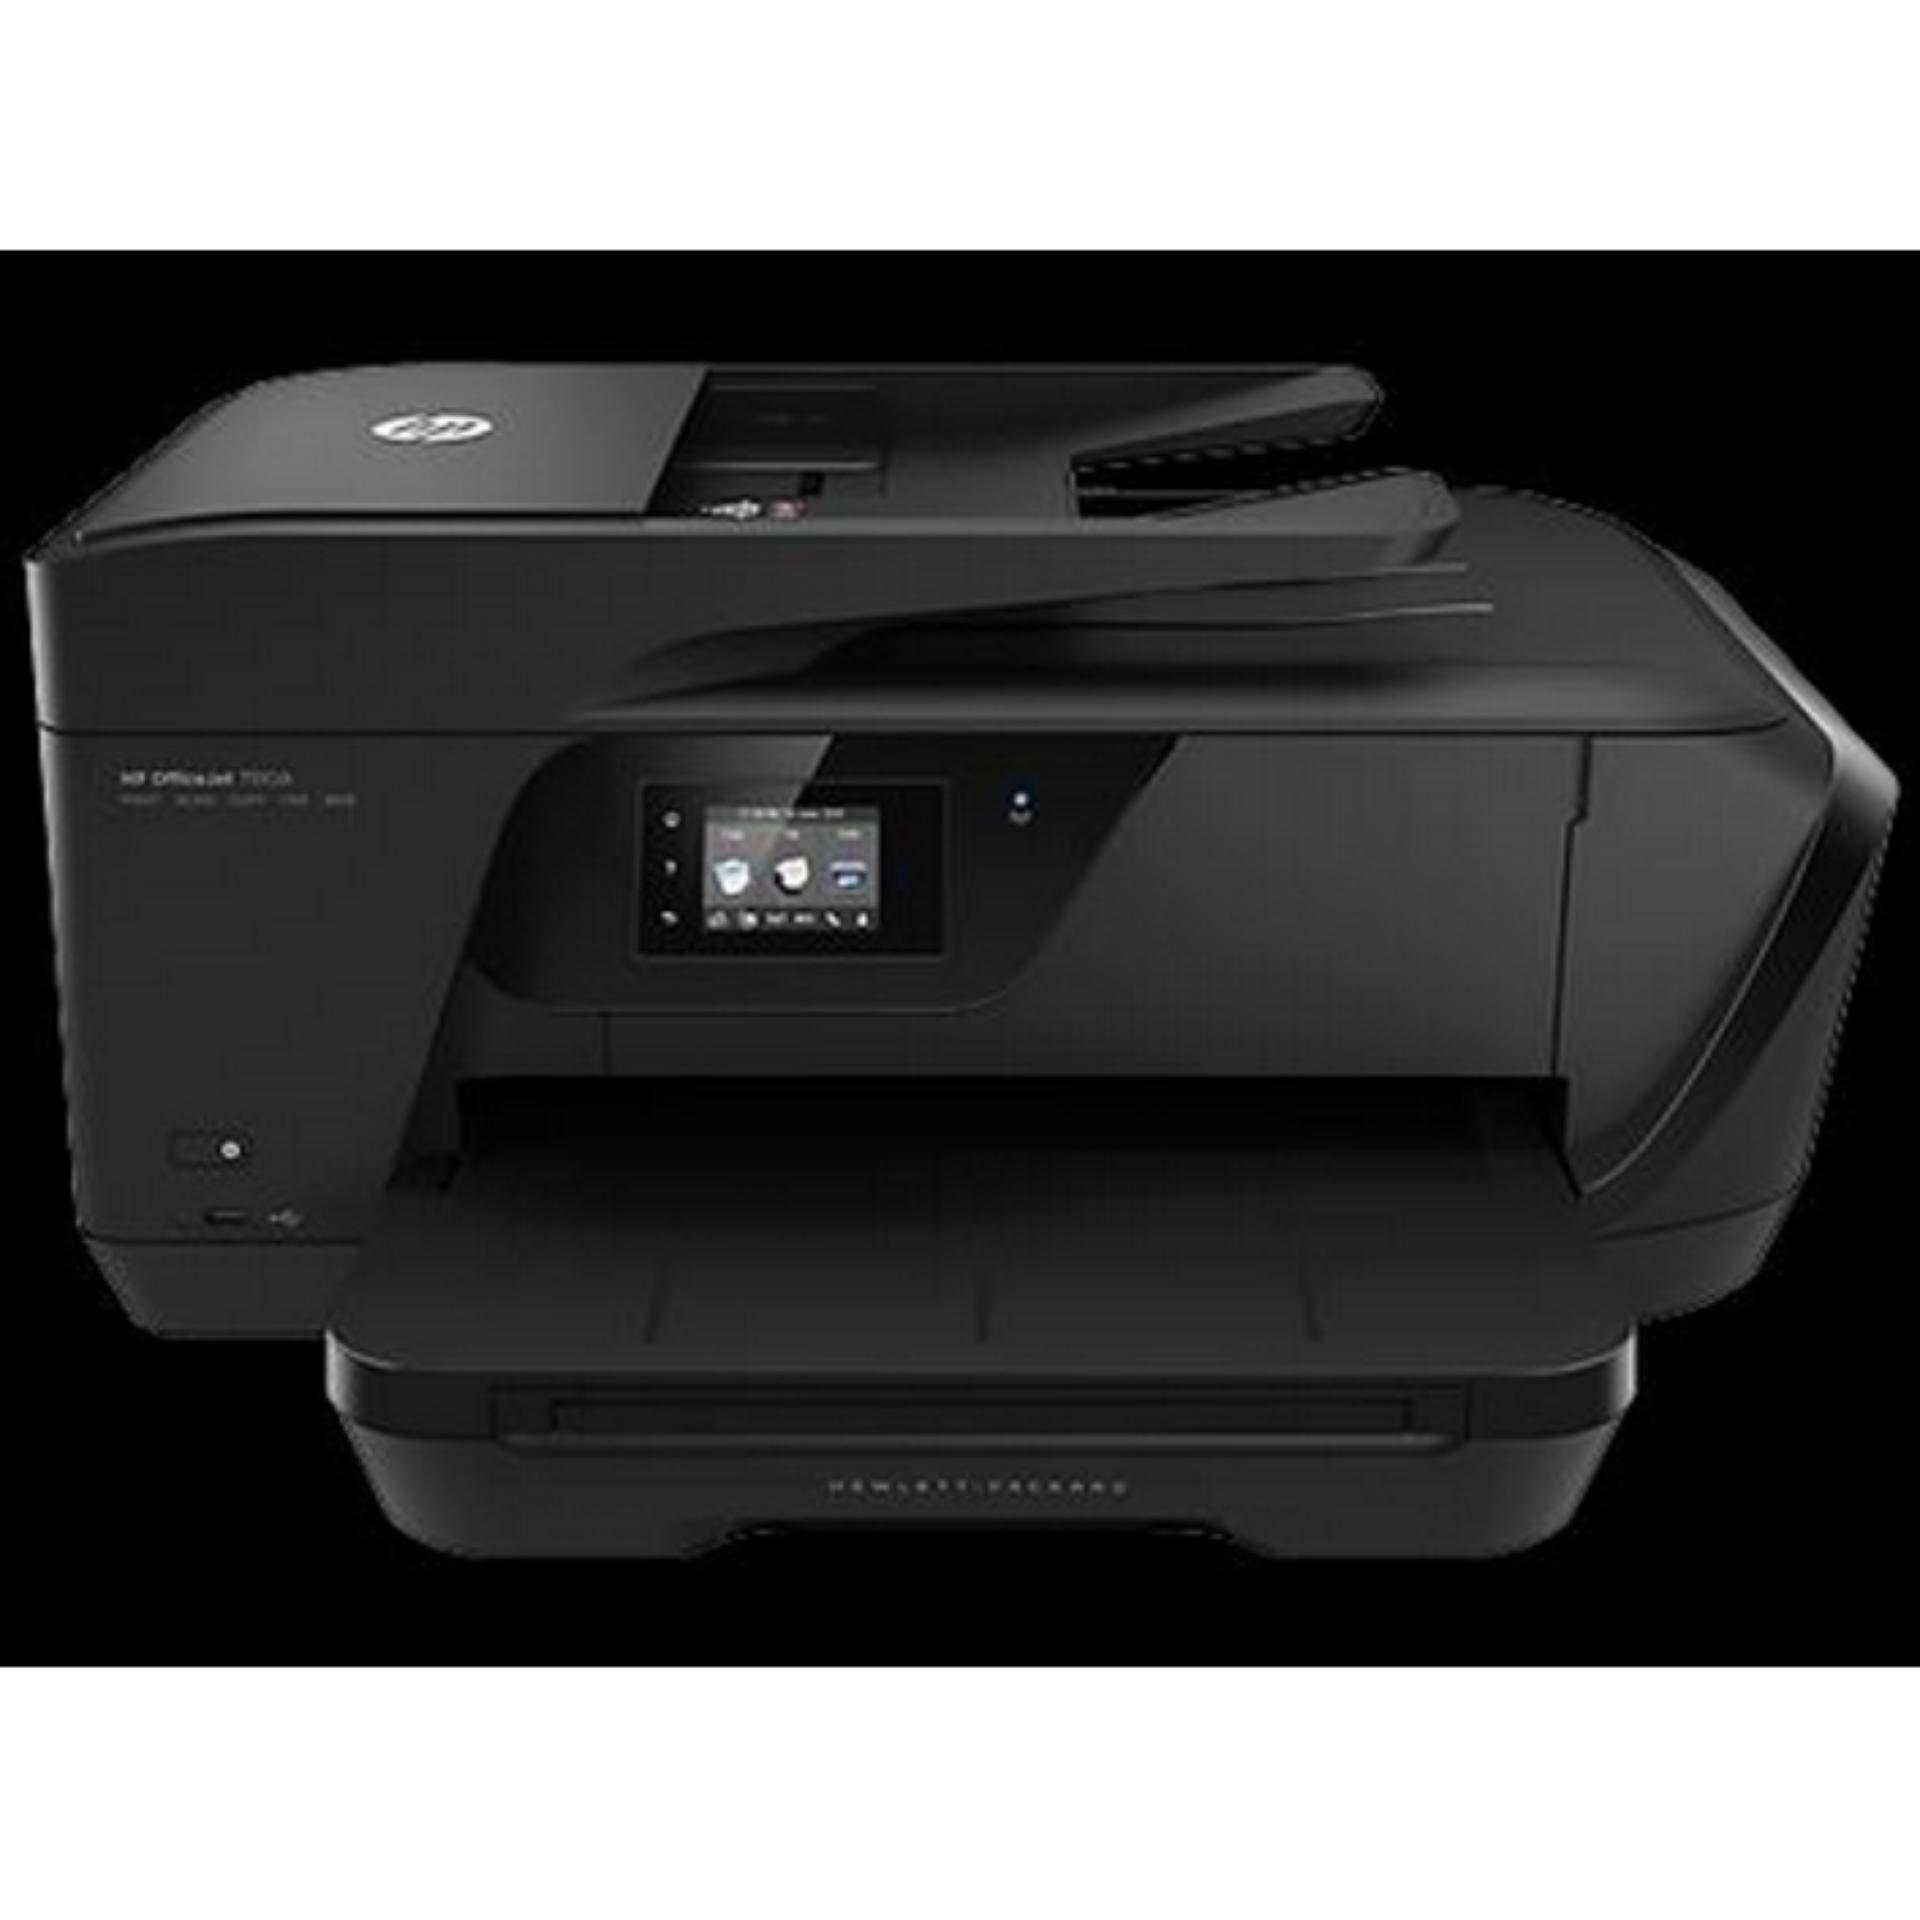 Hp Printer Officejet 7510 A3 Wide Format All In One Hitam Daftar 2676 Wifi Pengganti 3635 Oj Multi Fungsi Direct Print